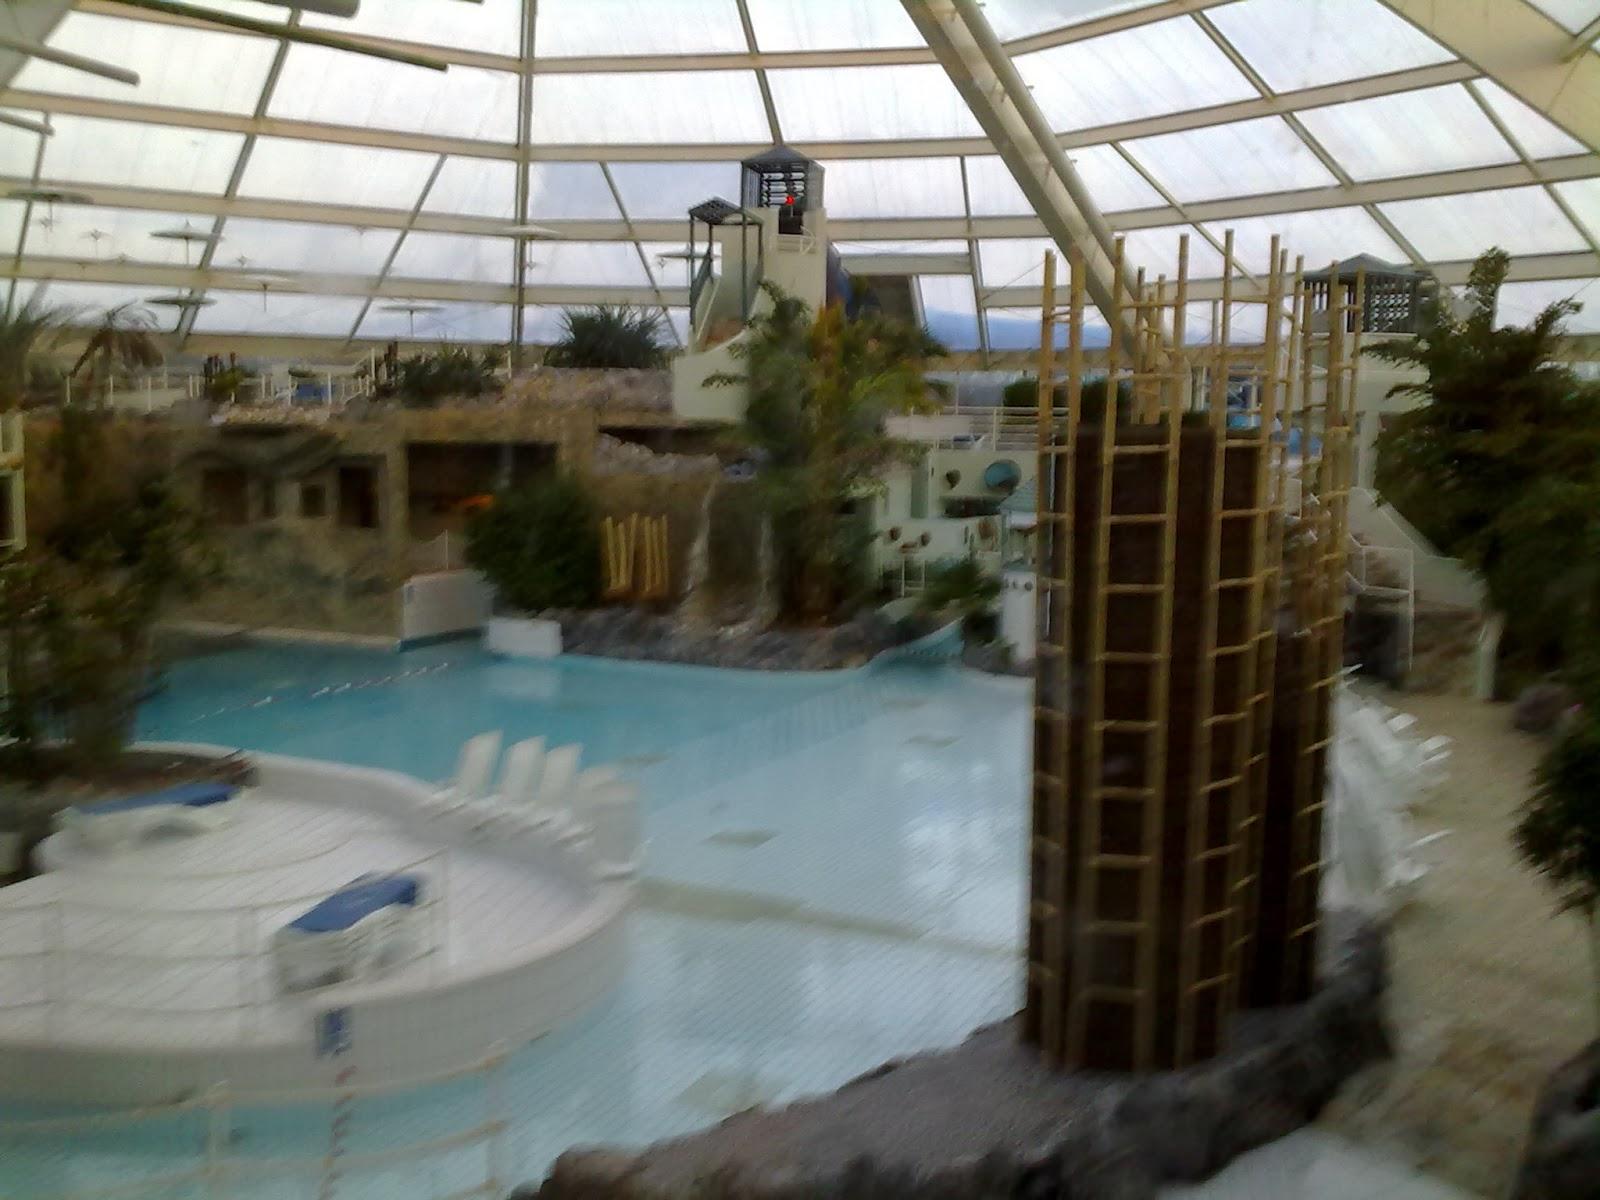 mes idees de sorties sympa photos piscine center parc park de haan. Black Bedroom Furniture Sets. Home Design Ideas